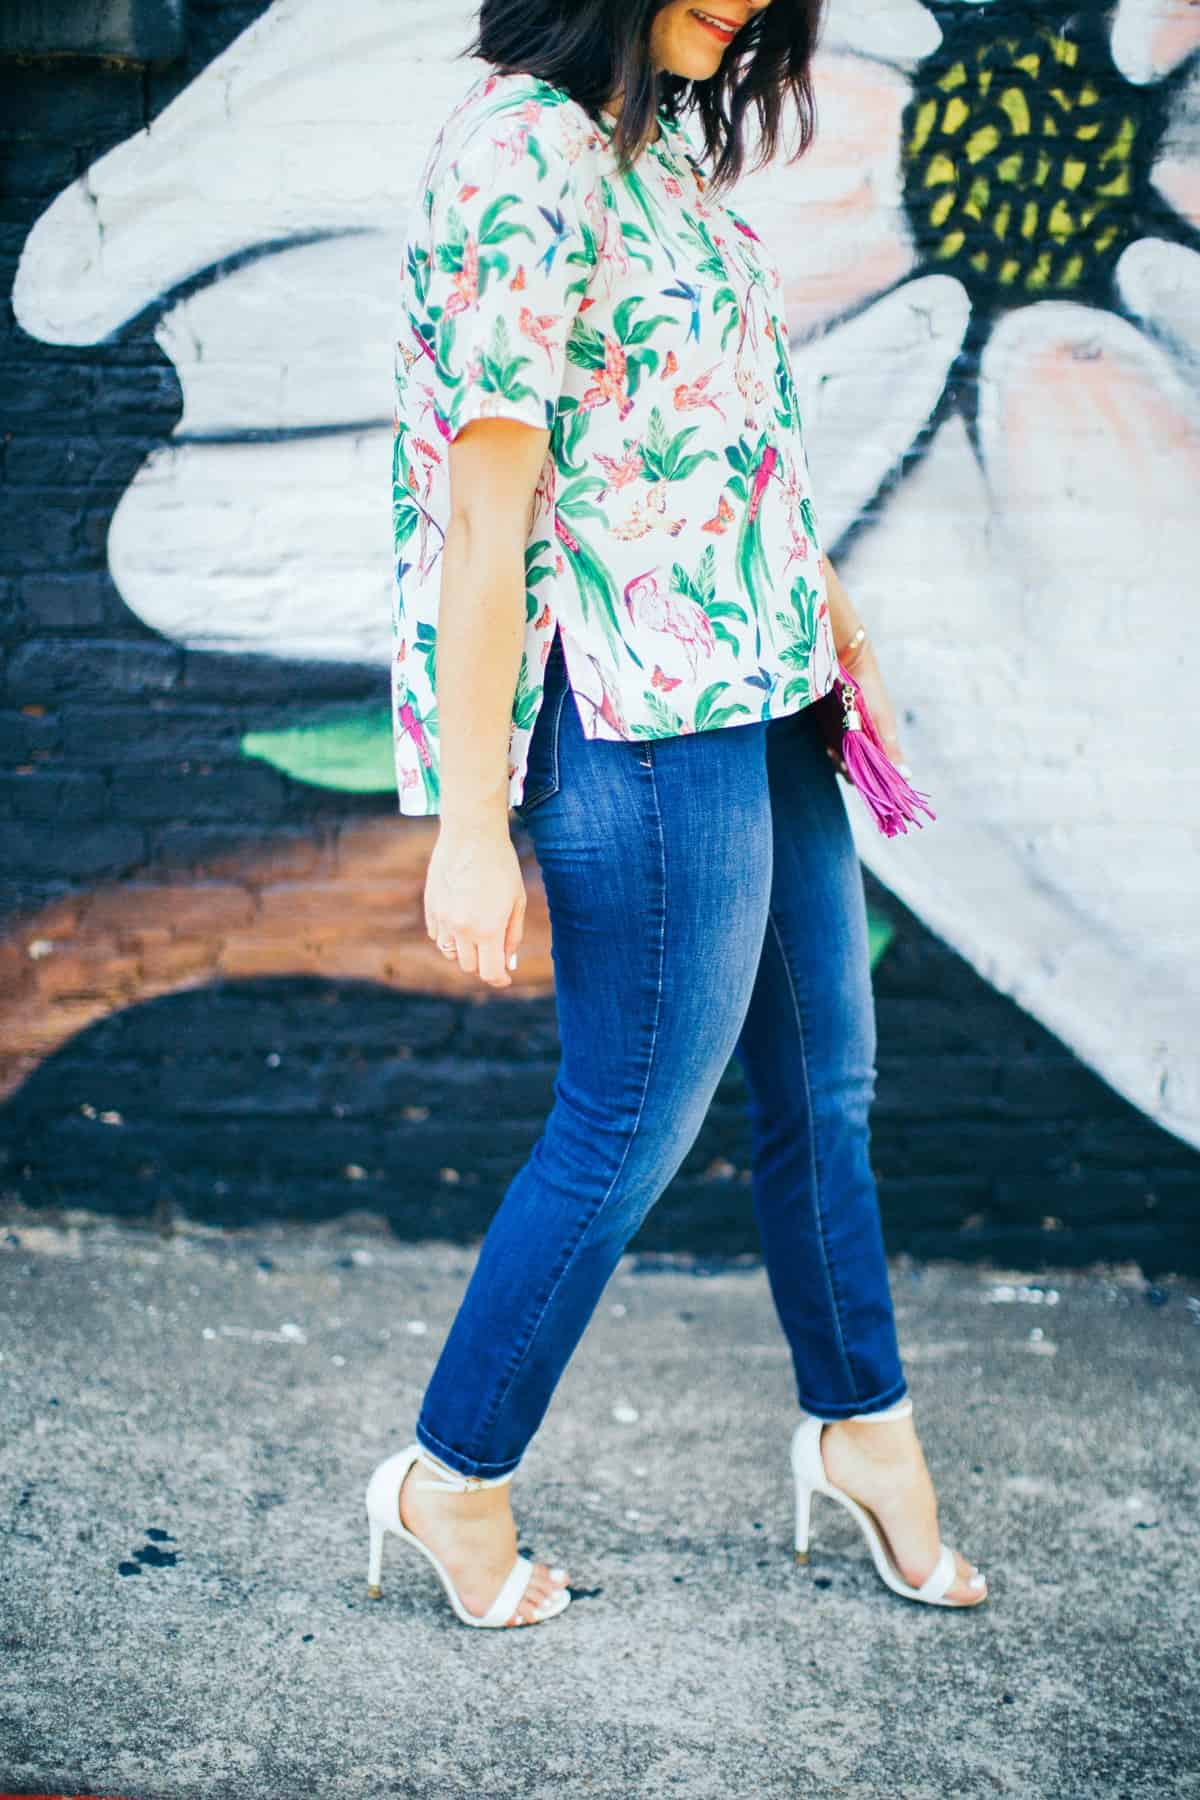 nydj cool embrace - summer date night outfit ideas - My Style Vita @mystylevita 10